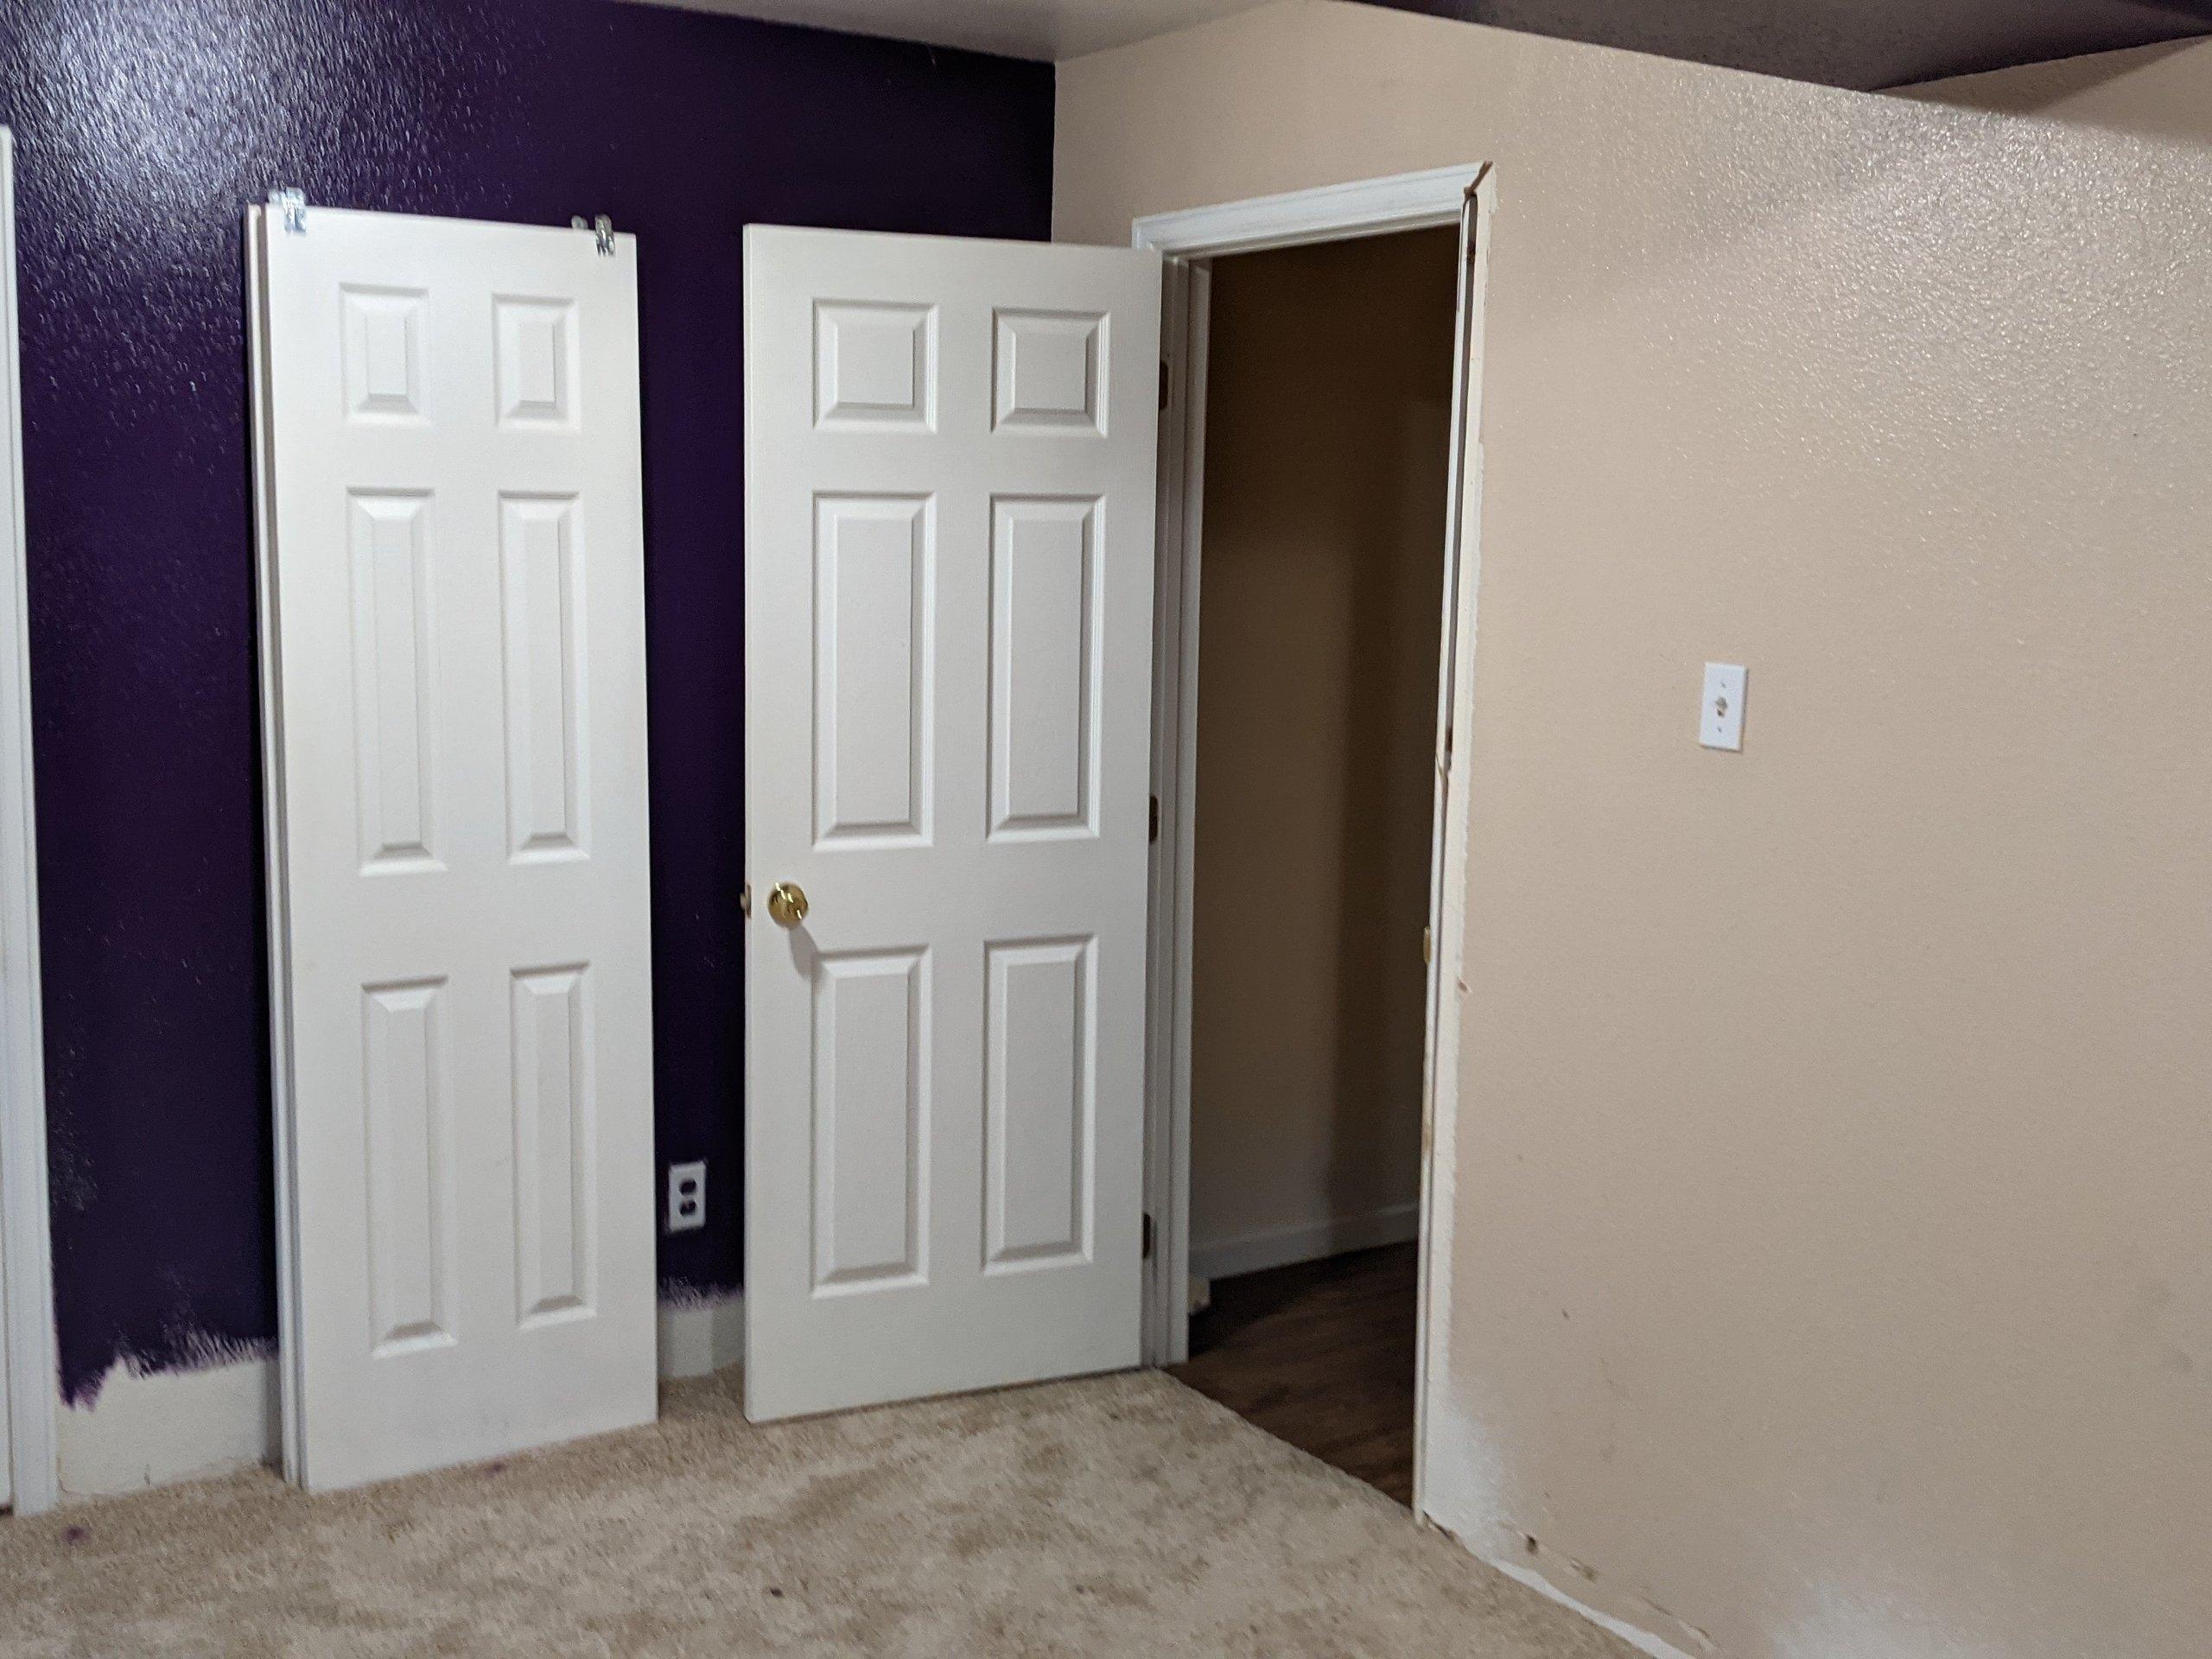 9x13 Bedroom self storage unit